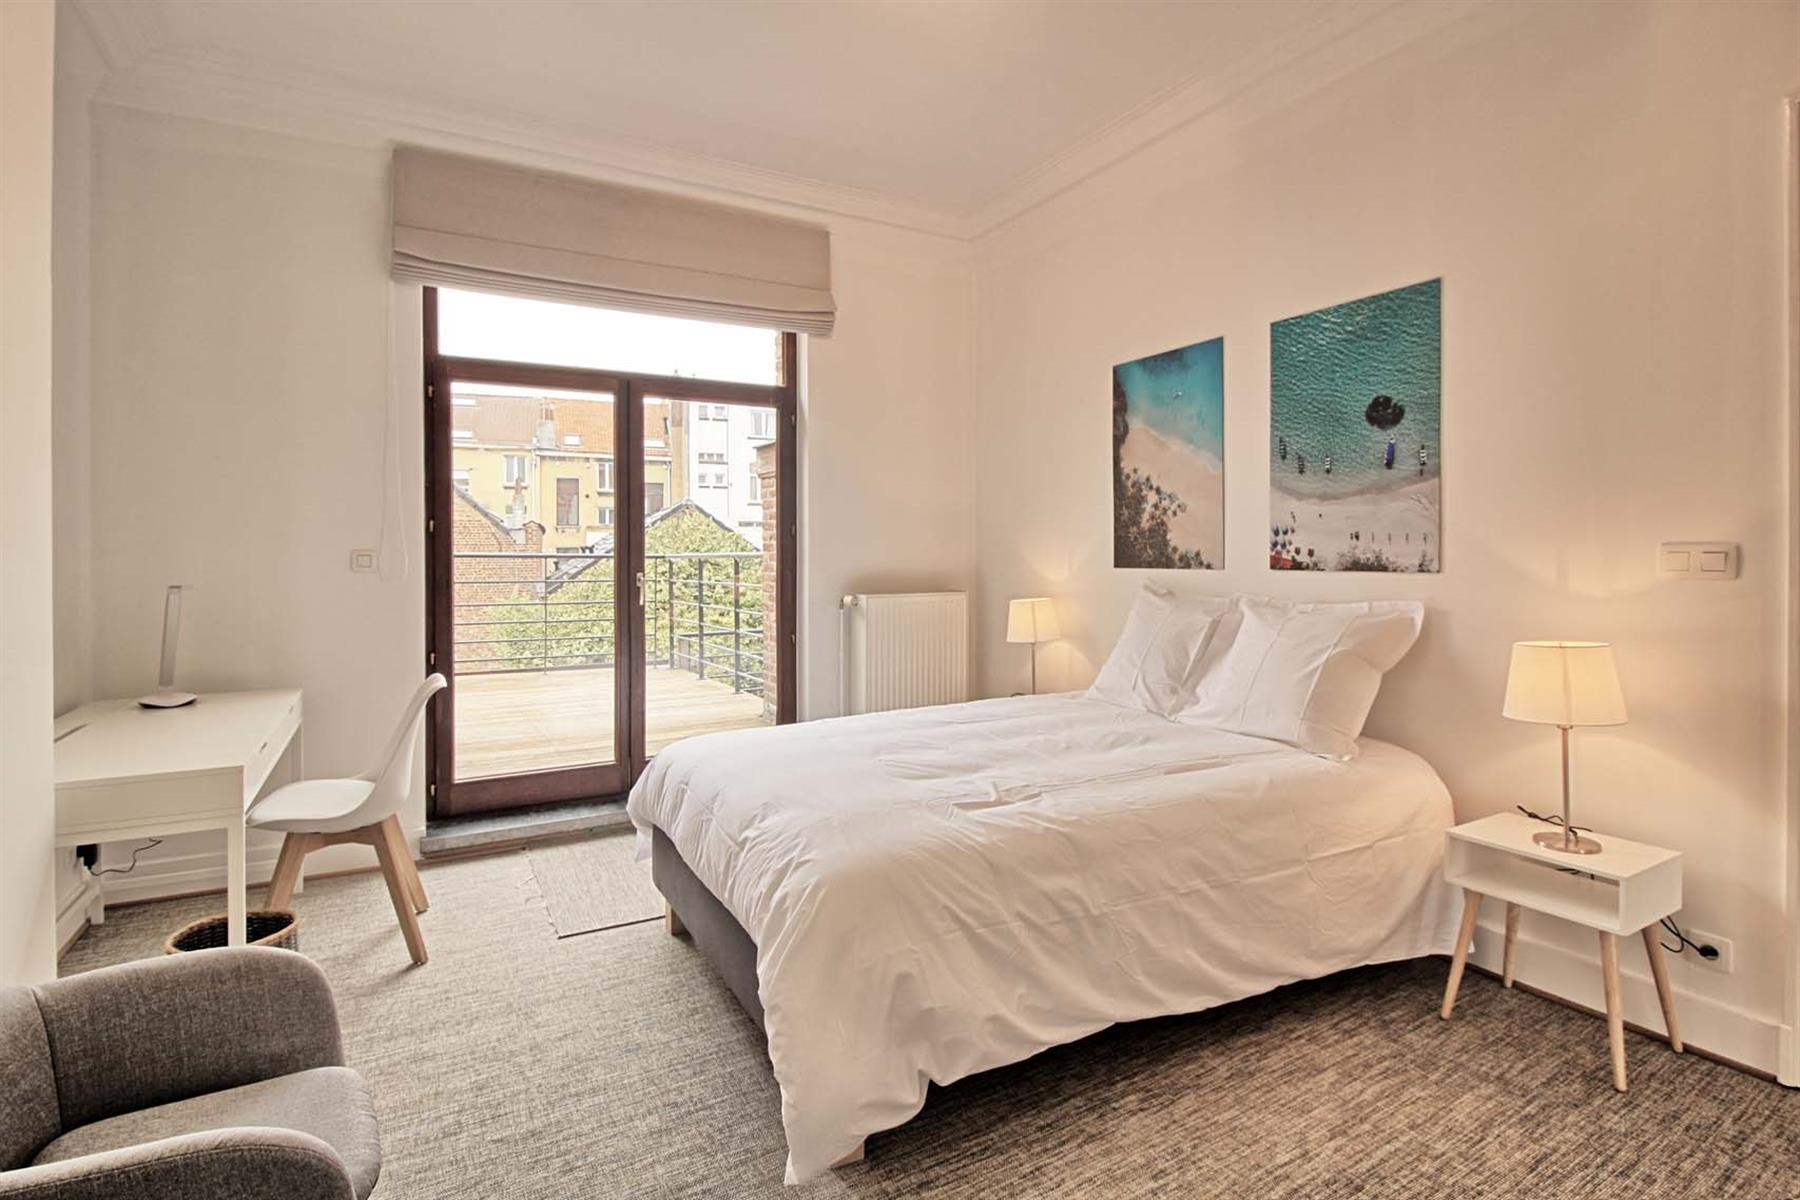 Maison - Ixelles - #4106764-19